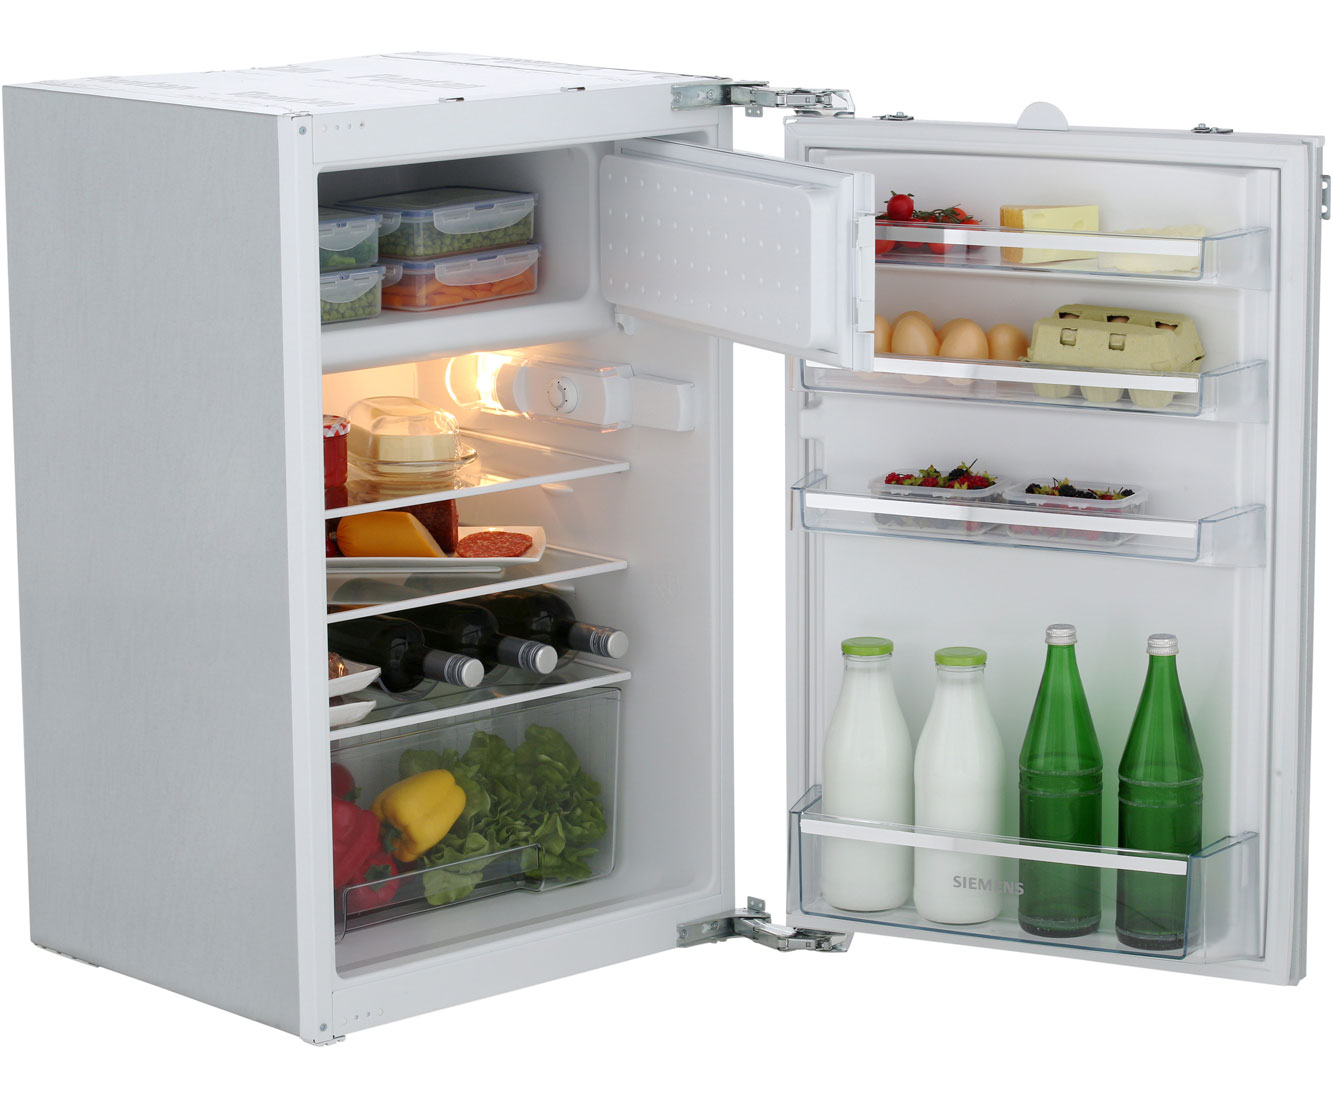 Siemens Kühlschrank : Siemens ki lv kühlschrank eingebaut cm weiß neu ebay